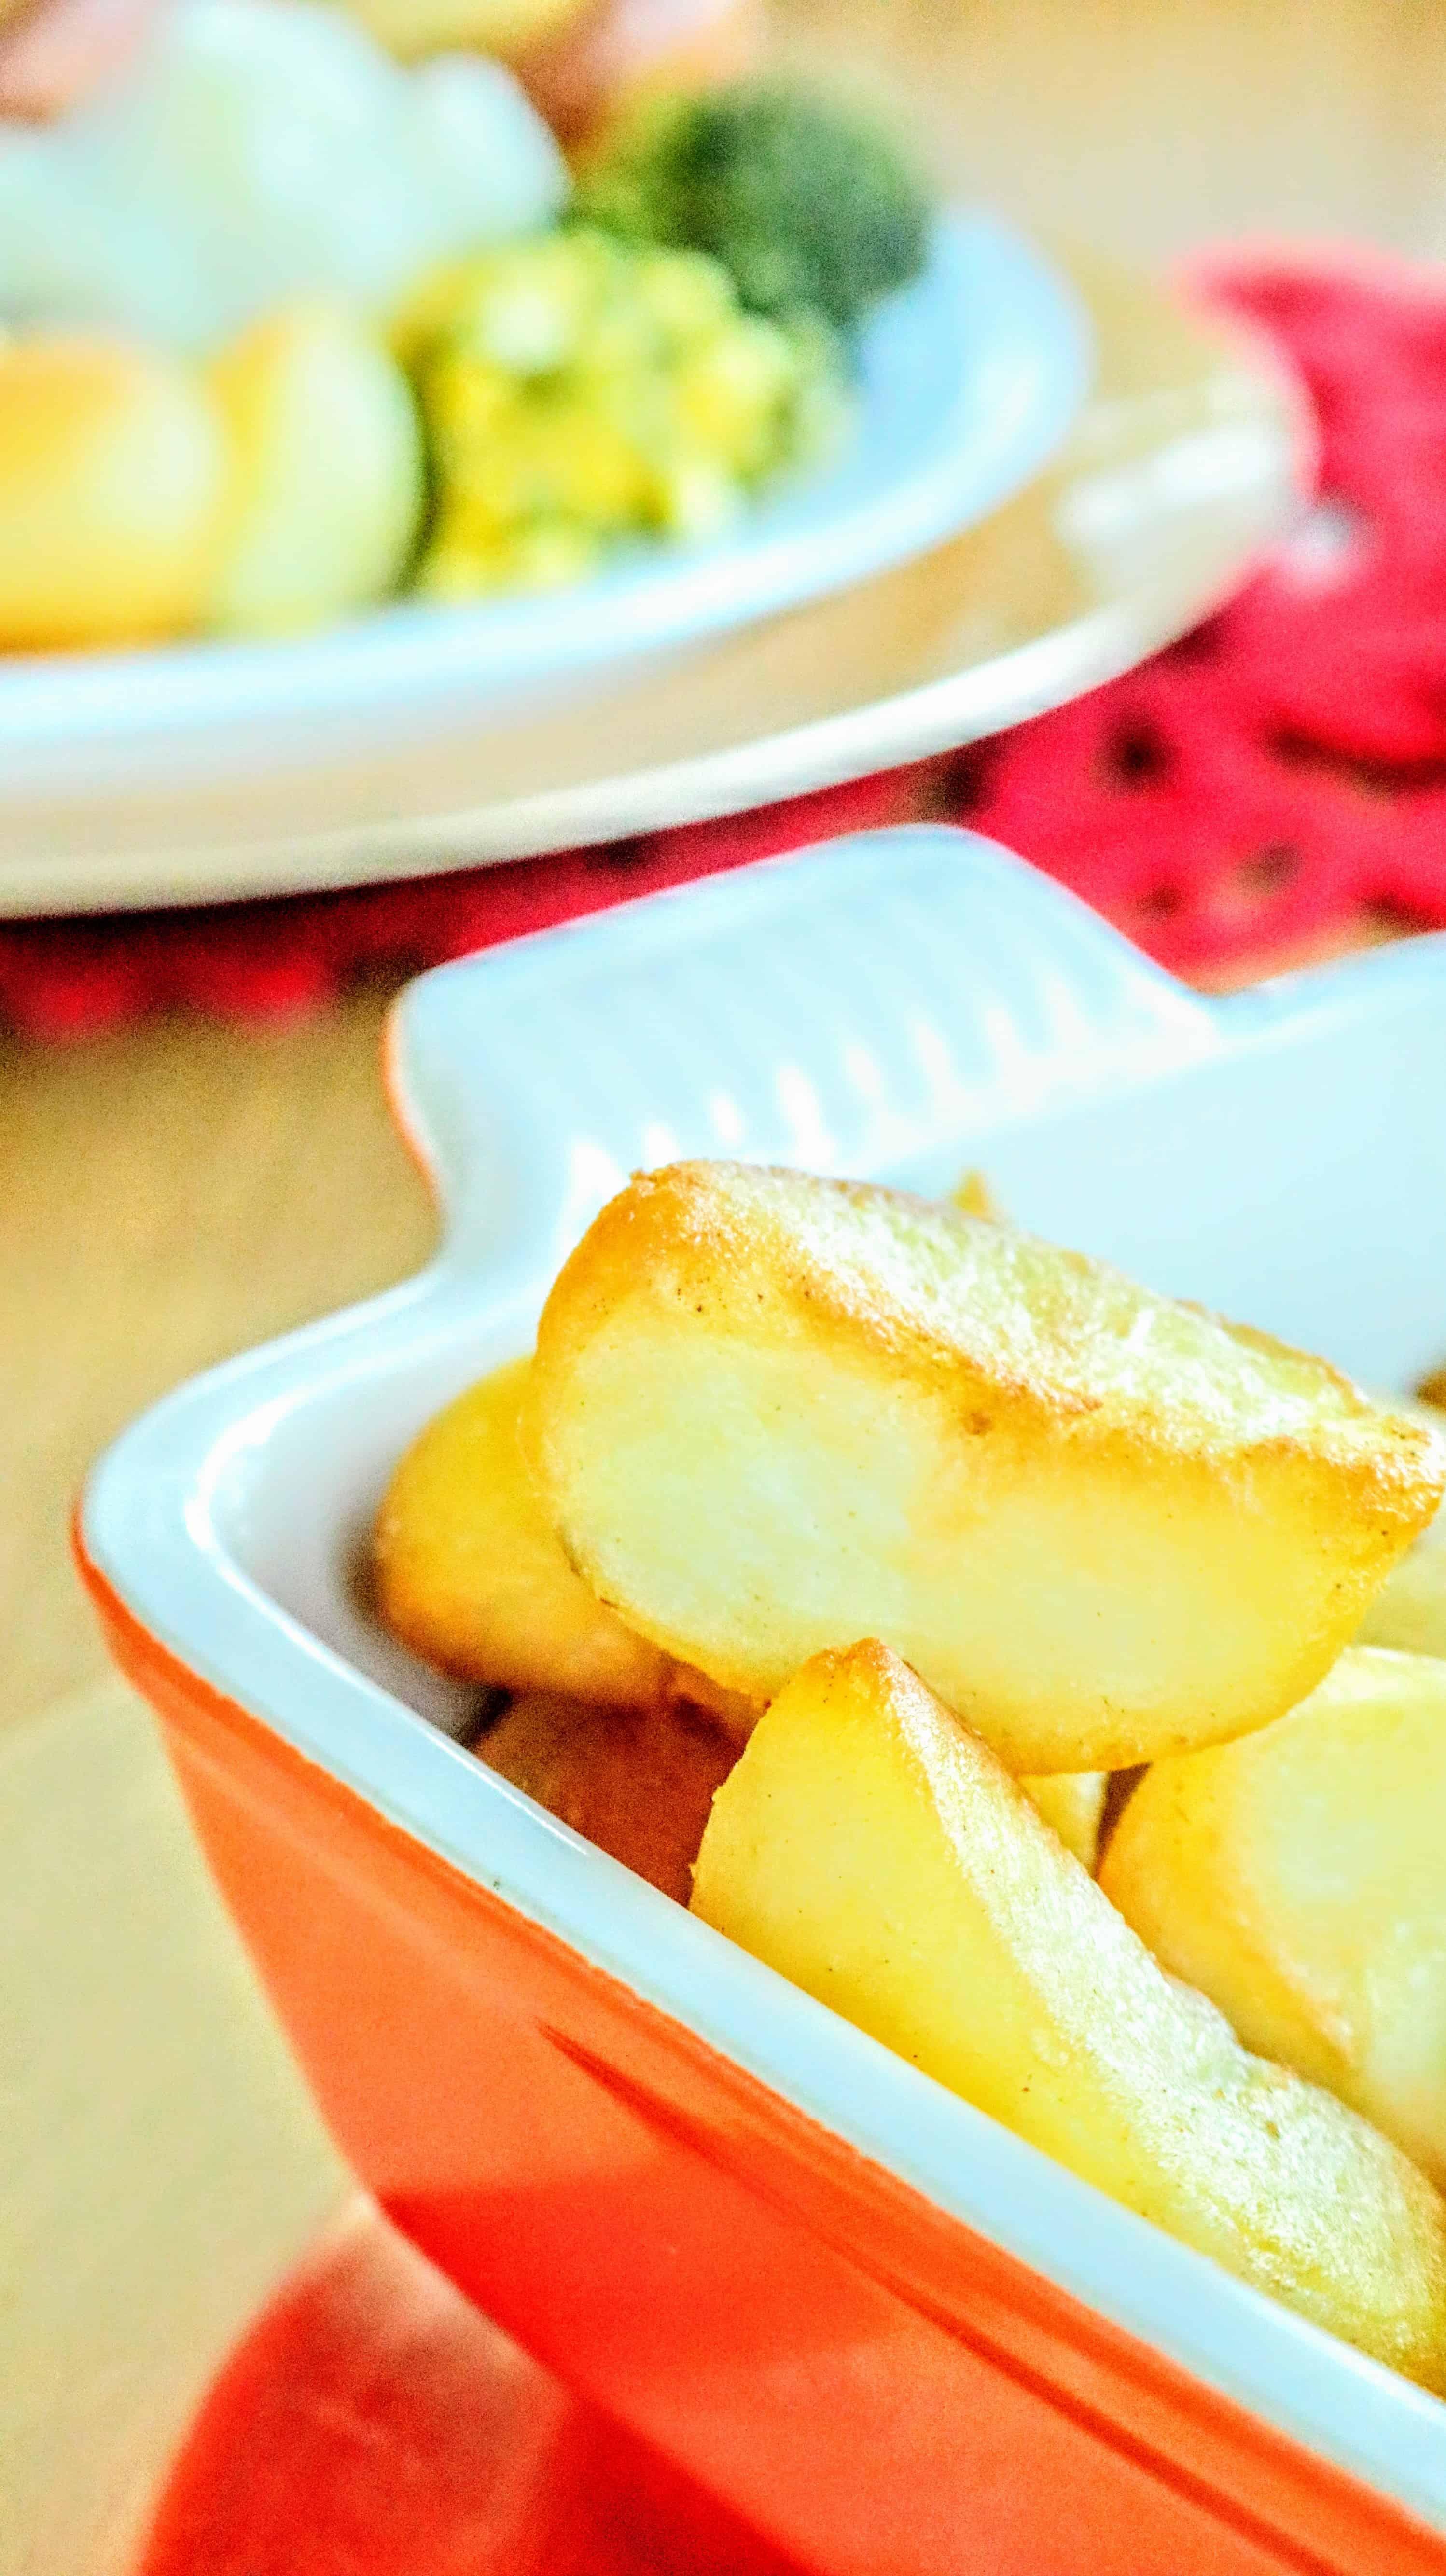 McCain Crispy & Fluffy Beef Roast Potatoes in Beef Dripping